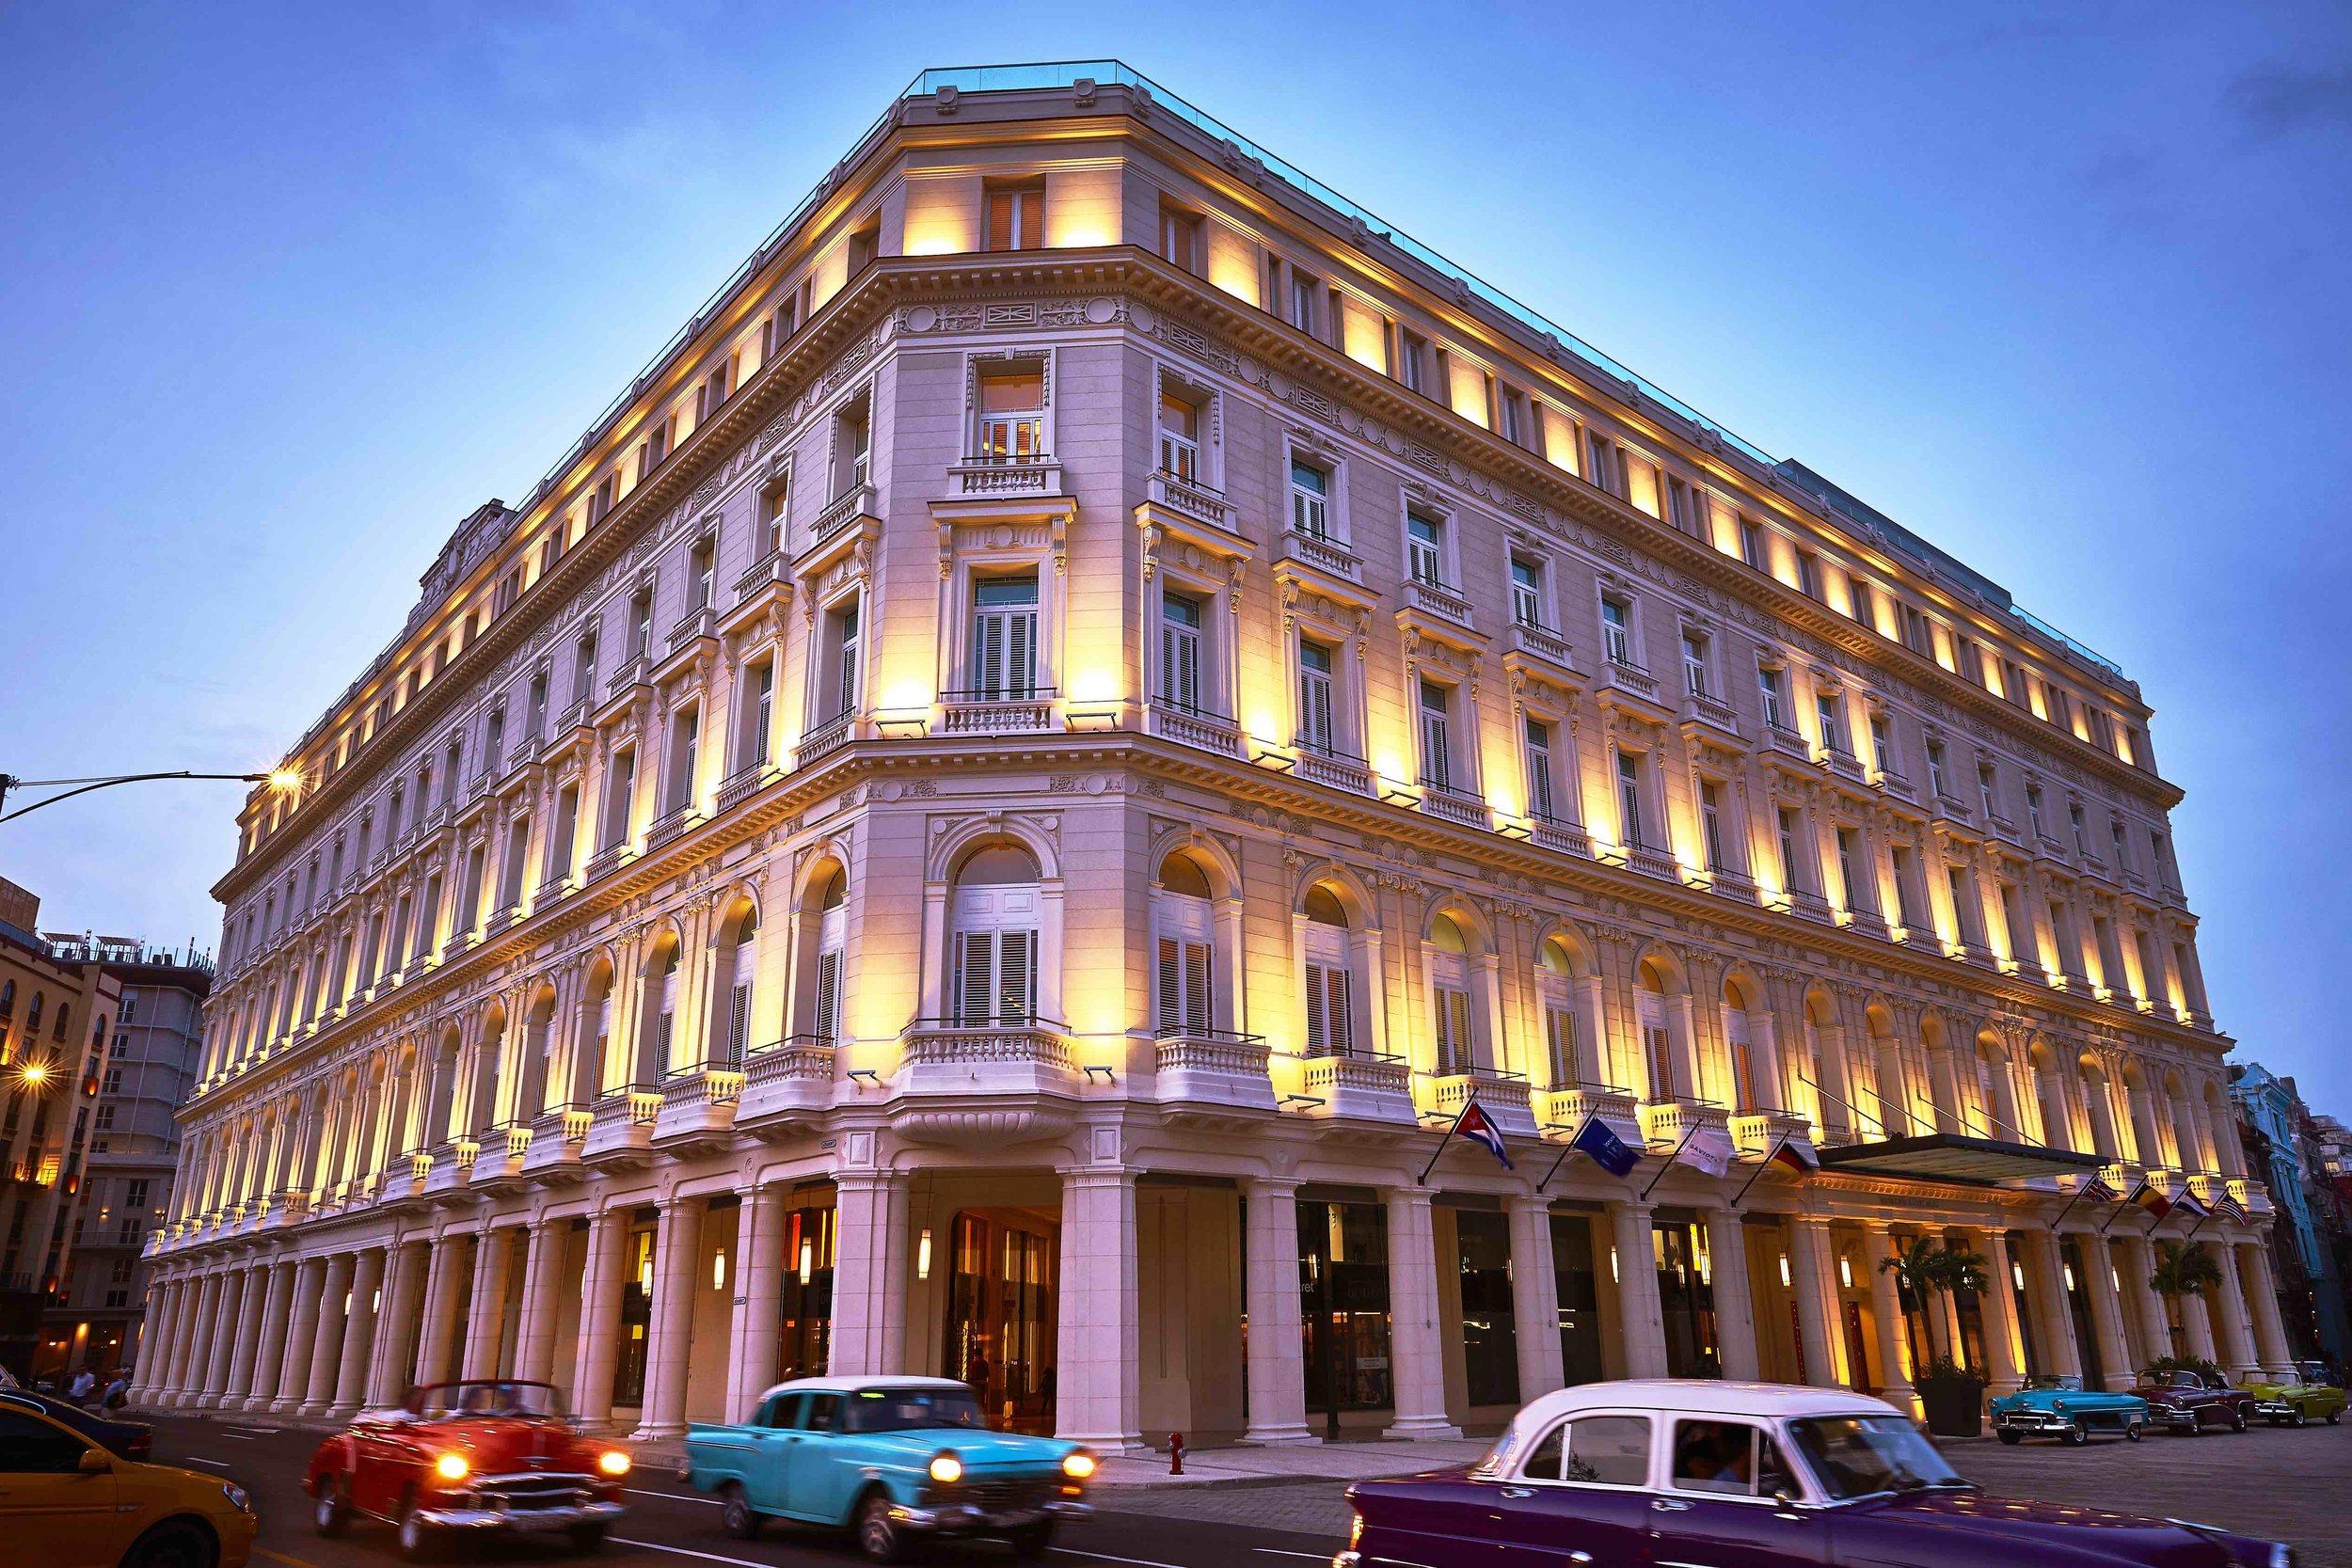 The Gran Hotel Manzana Kempinksi La Habana